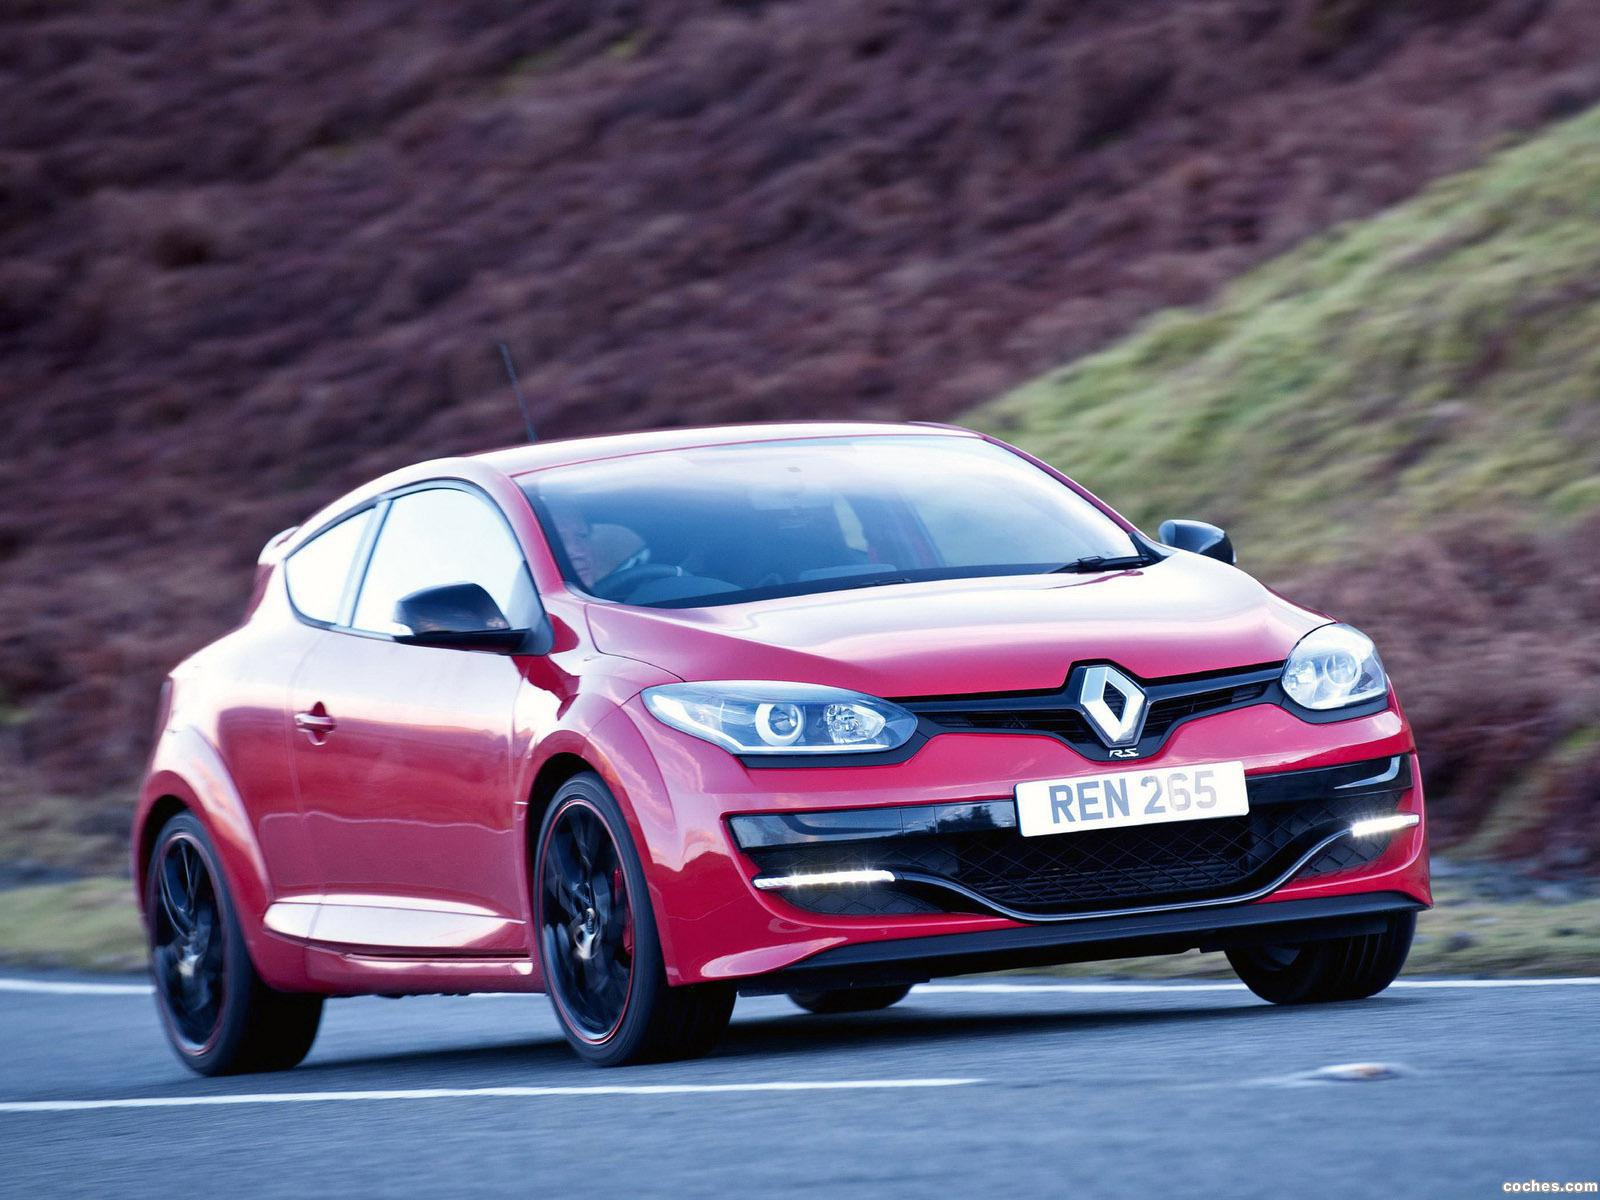 Foto 2 de Renault Megane R.S. 265 UK 2014